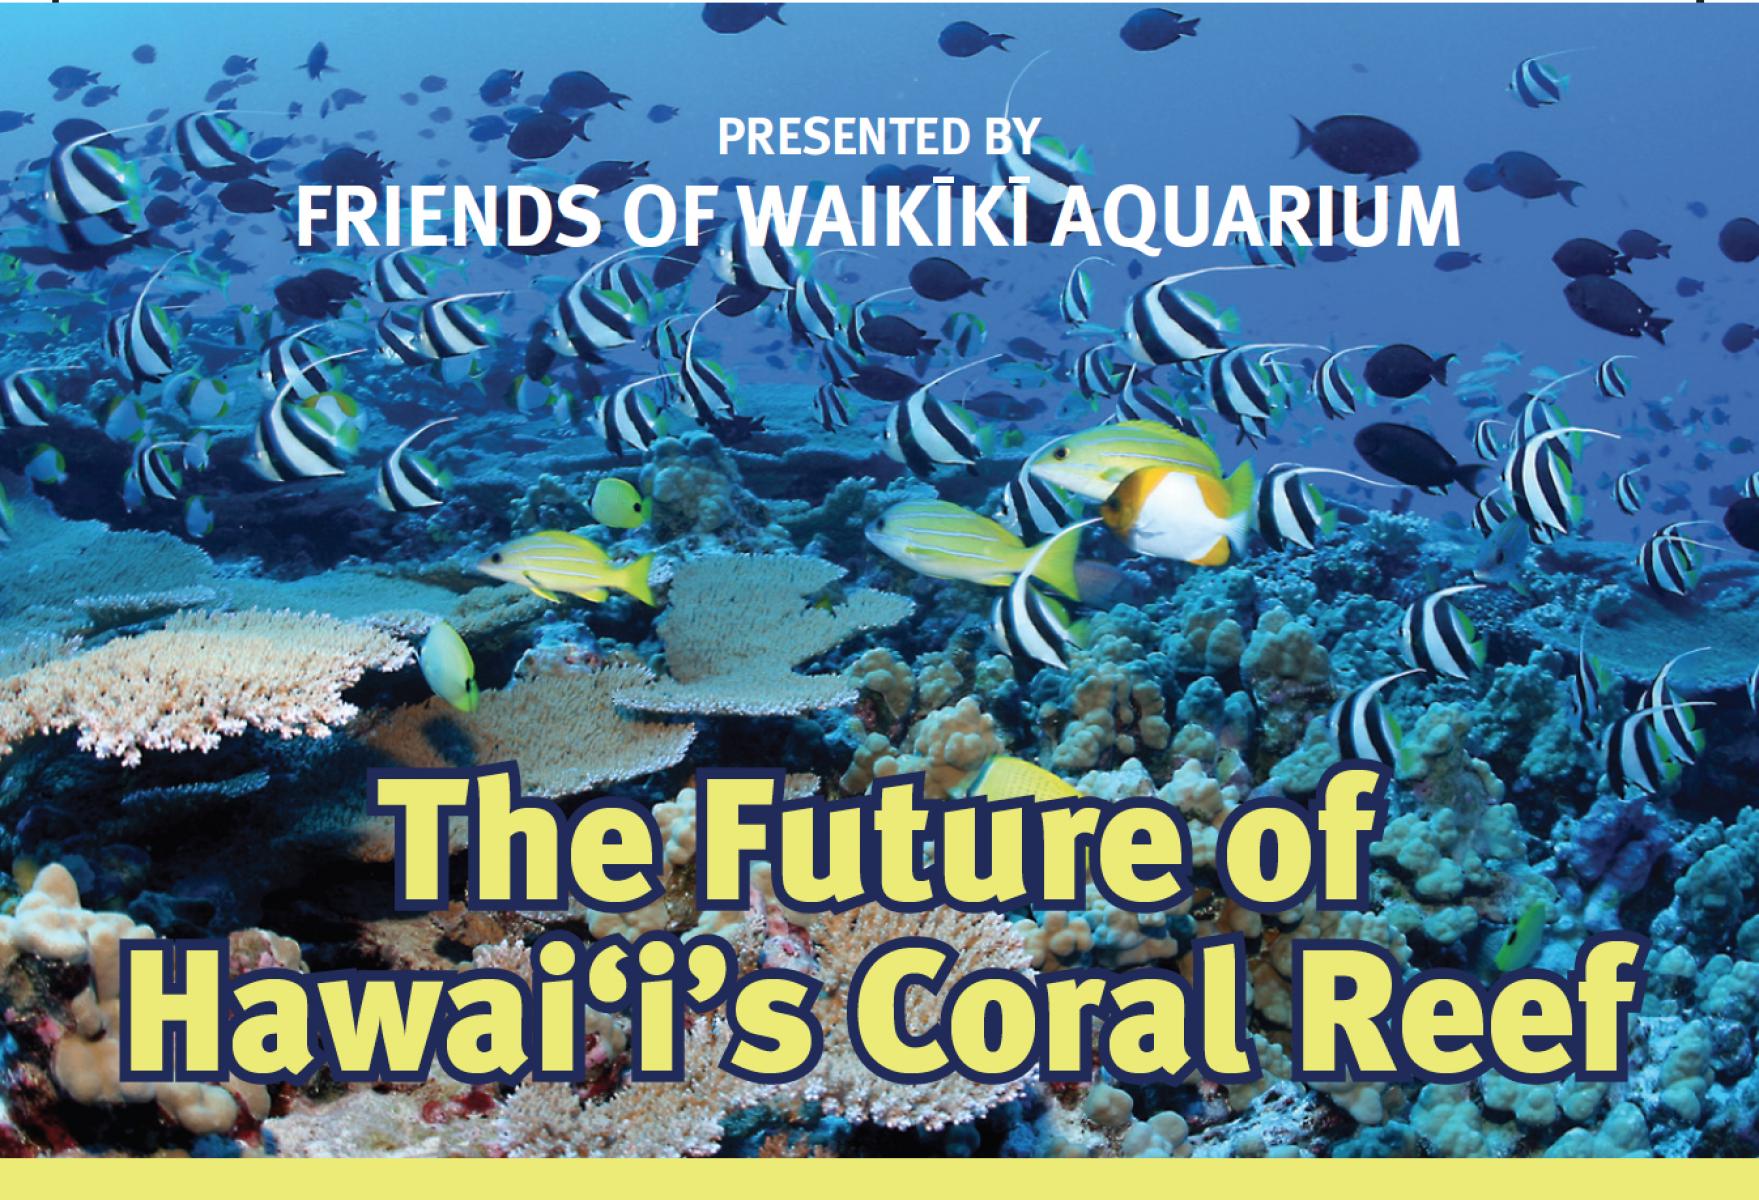 Waikiki Aquarium's Distinguished Lecture Series with Dr. Robert Toonen